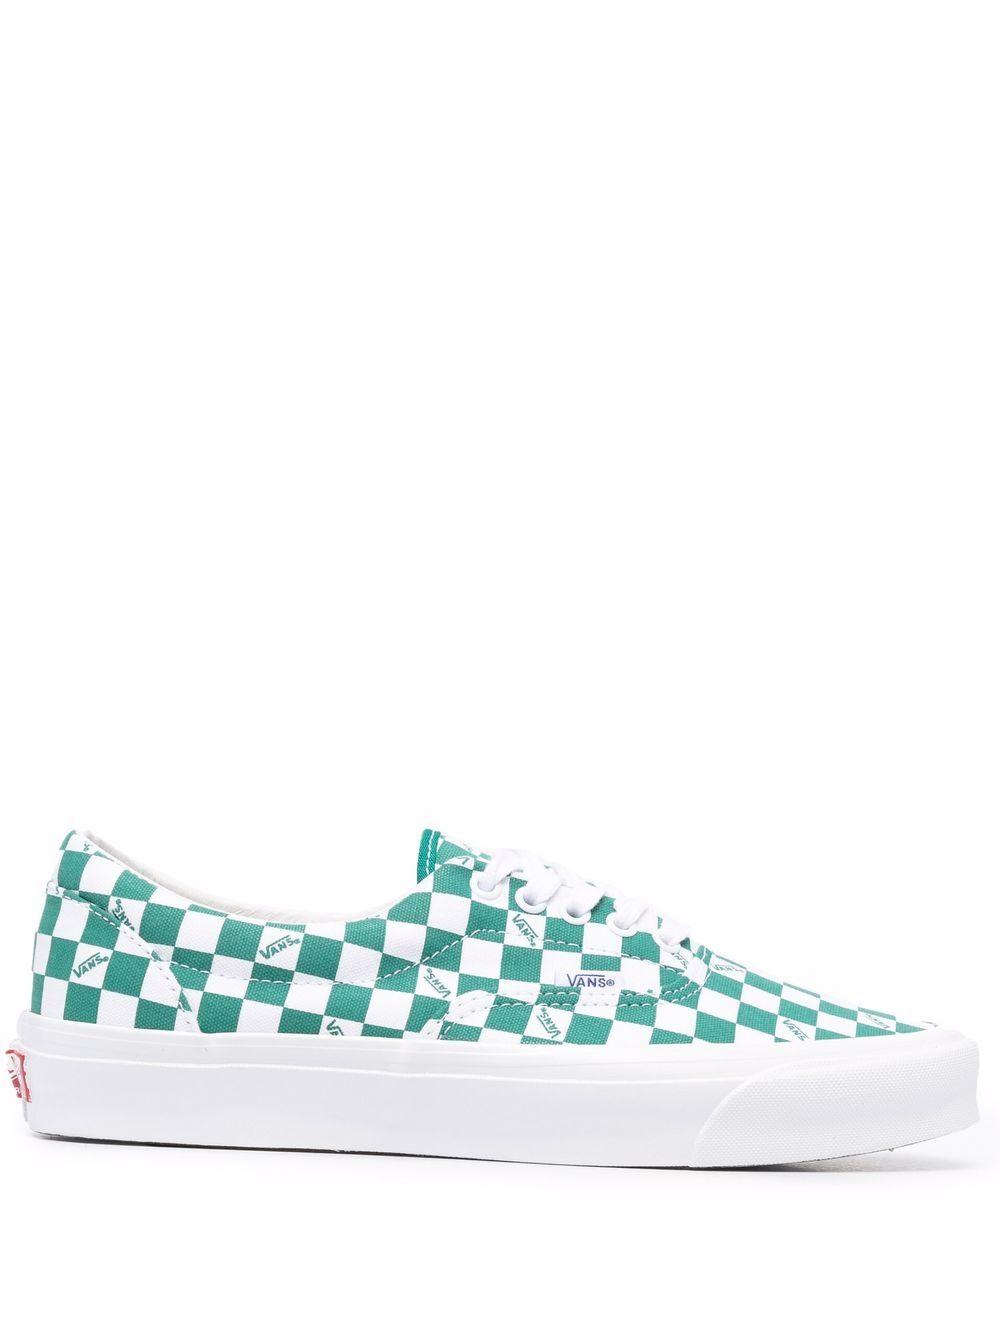 sneakers og era lx unisex white and green VANS VAULT | Sneakers | VN0A3CXN9TX1